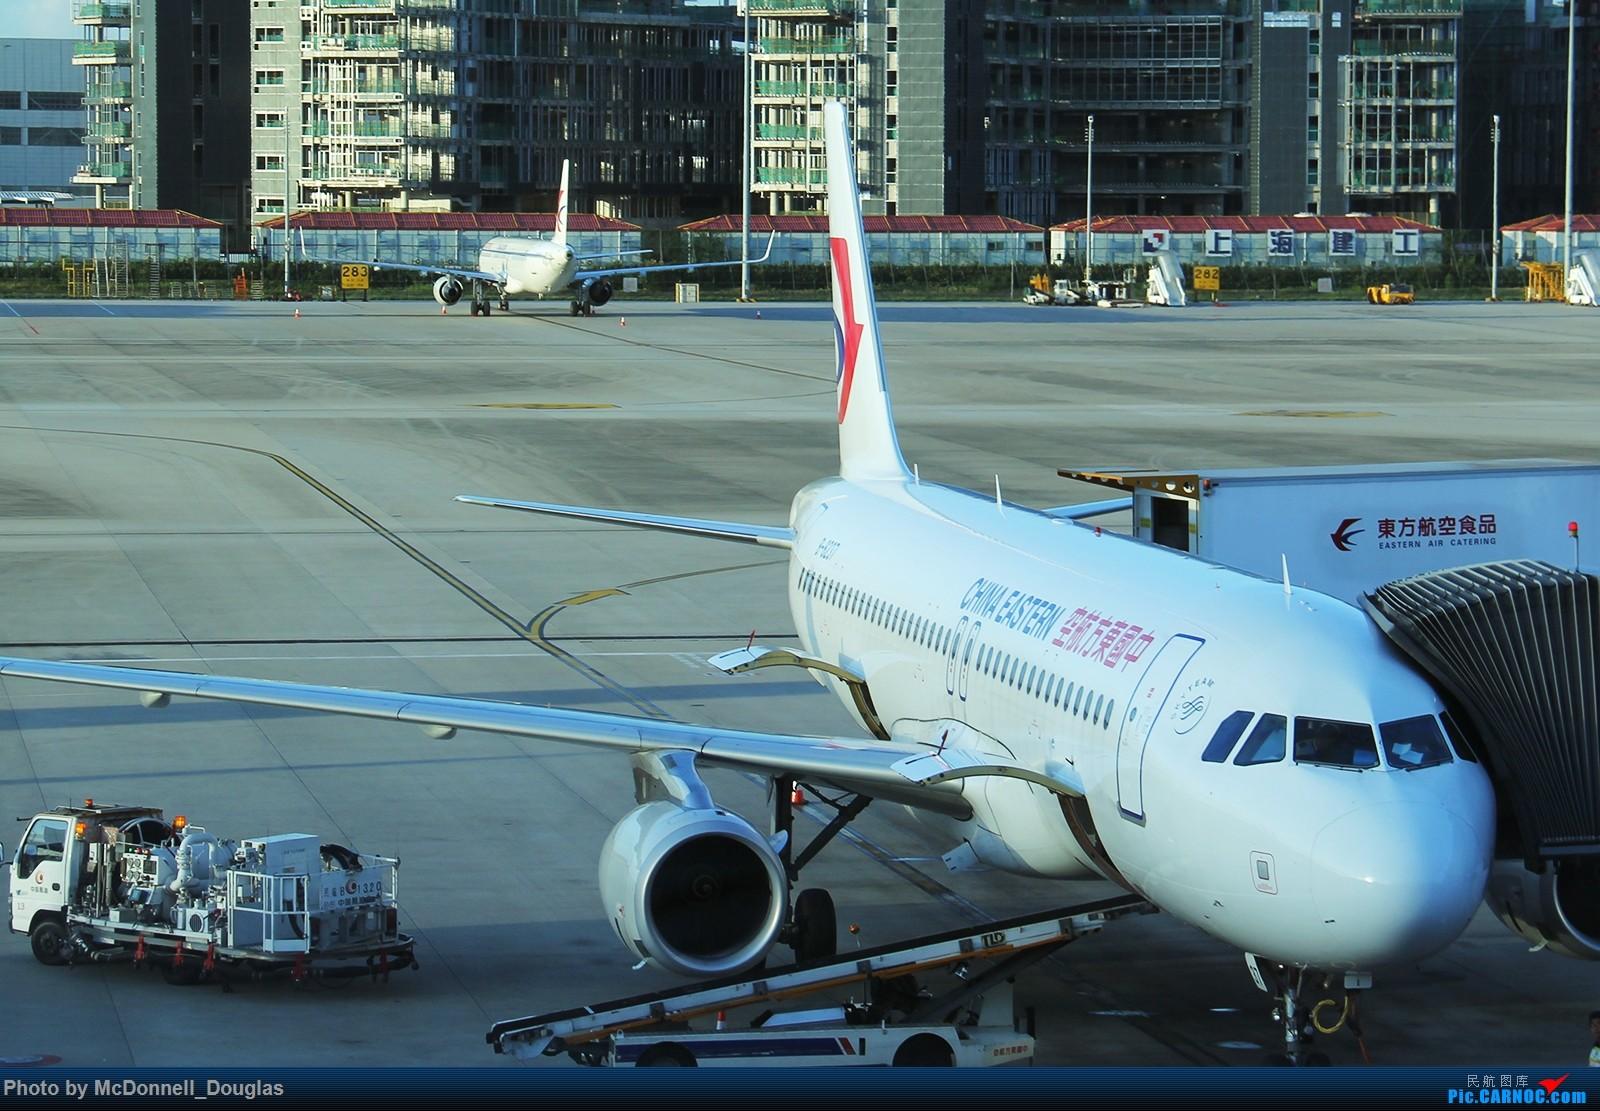 Re:[原创]【上海飞友会】【zc带你走天下(2)】再访祖辈年轻时工作的土地,父母年少时生活戈壁,跨越大半个中国去看新疆,回程小游蓉城(上) AIRBUS A320-232 B-8237 中国上海浦东国际机场